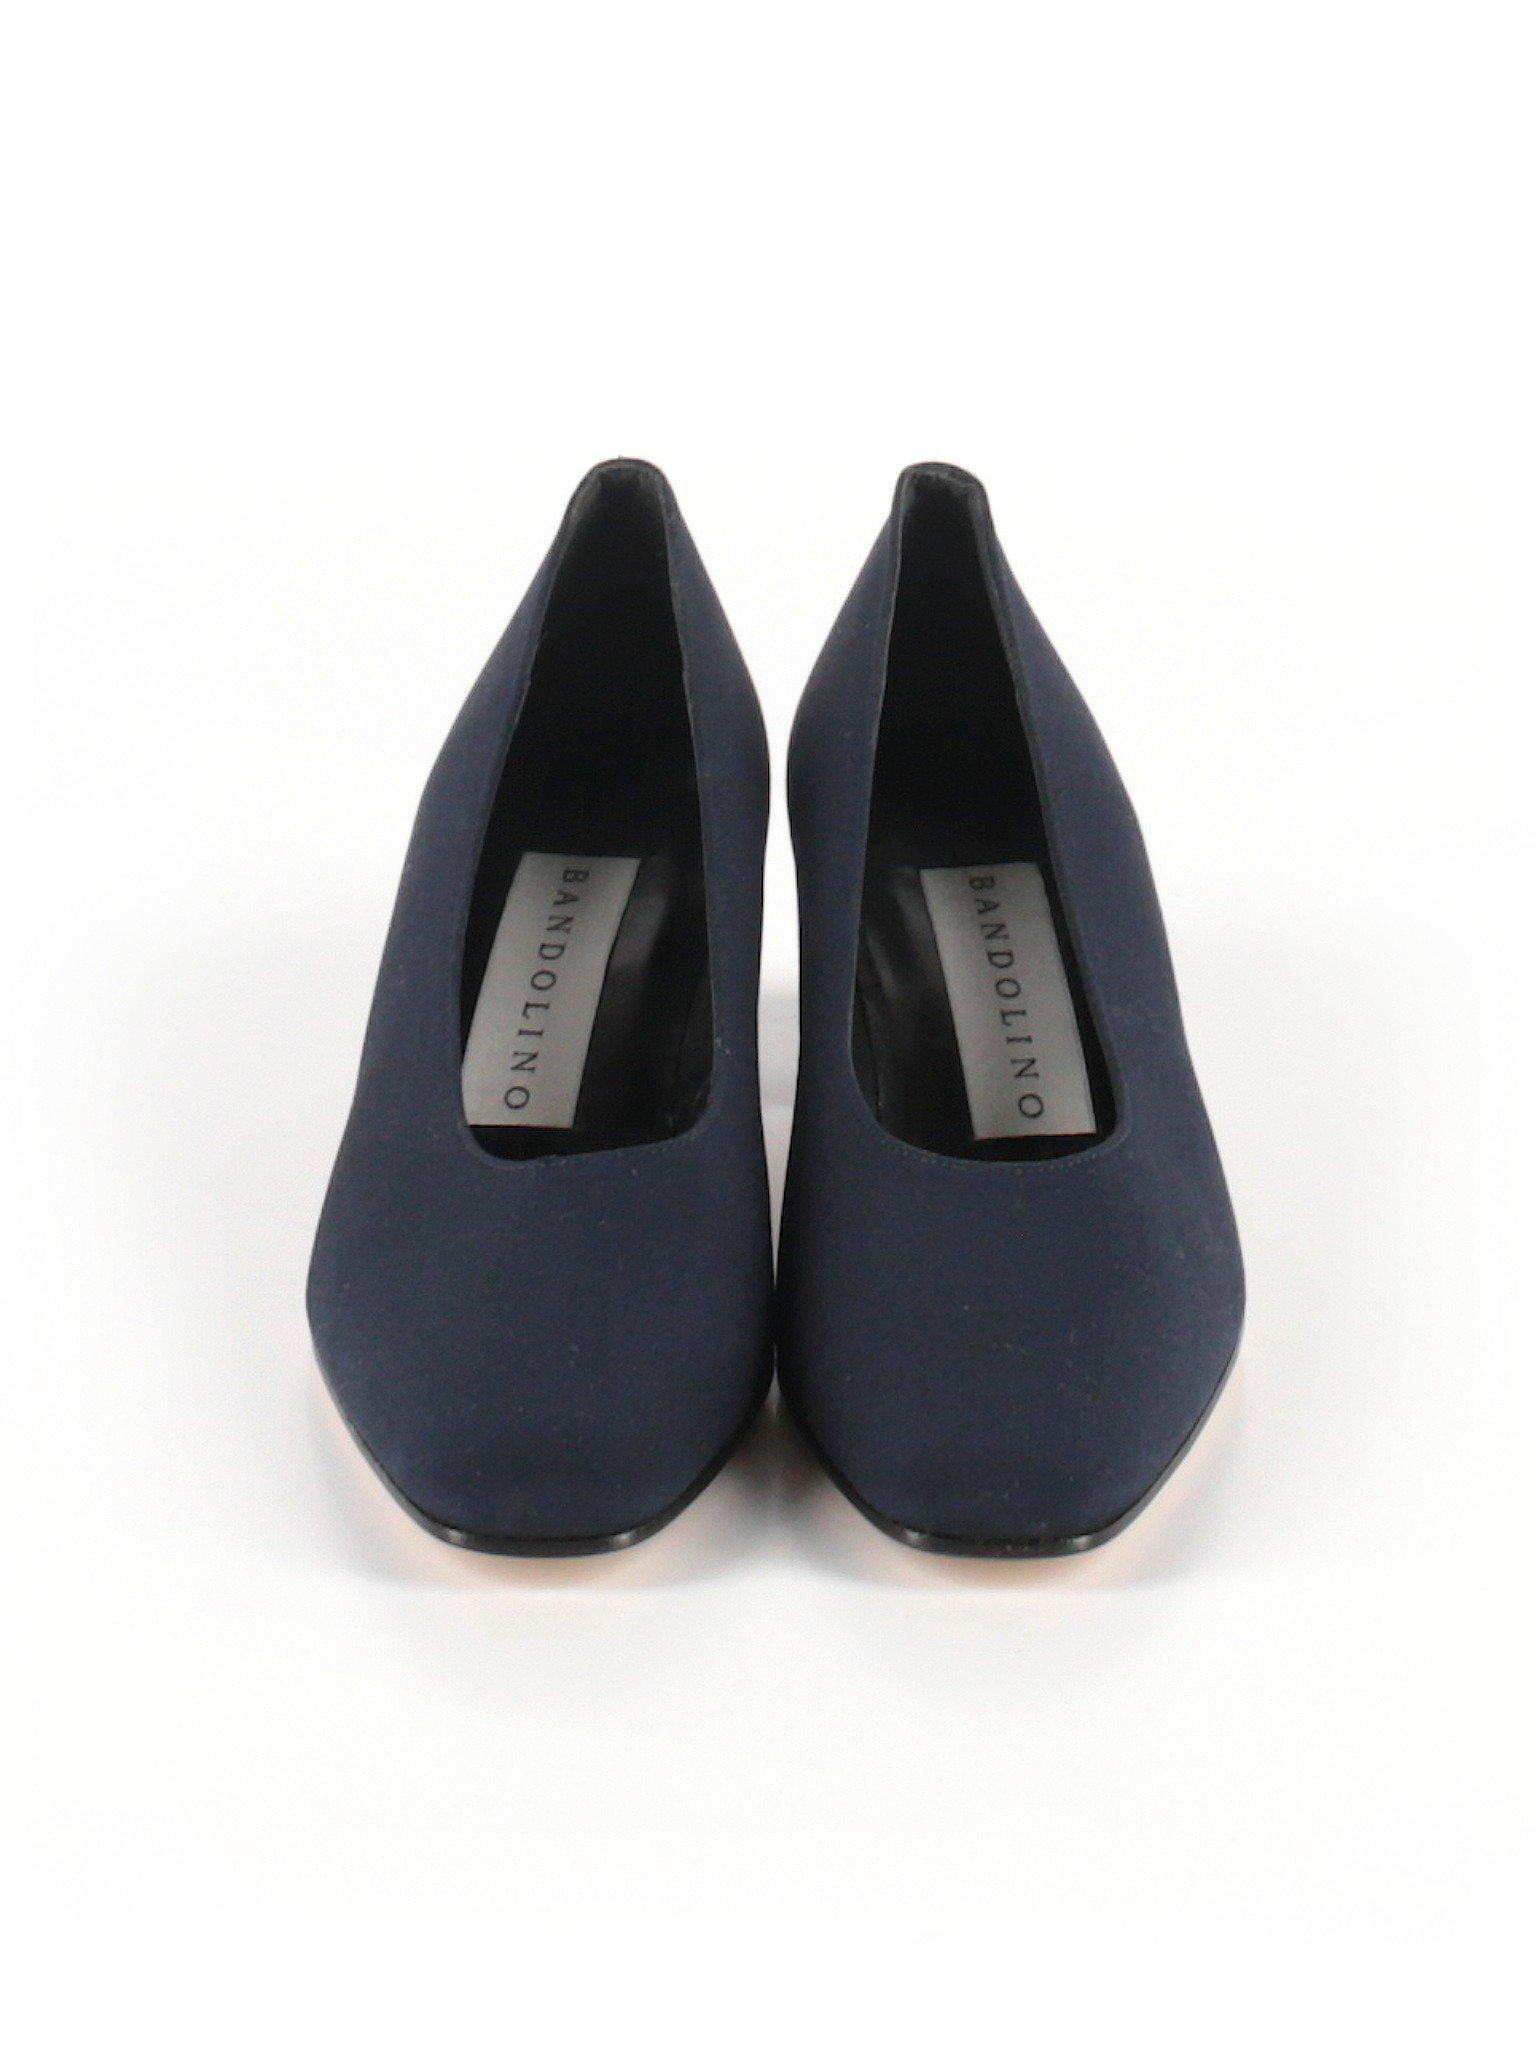 Bandolino Heels Boutique Boutique promotion promotion tF1qBWwF